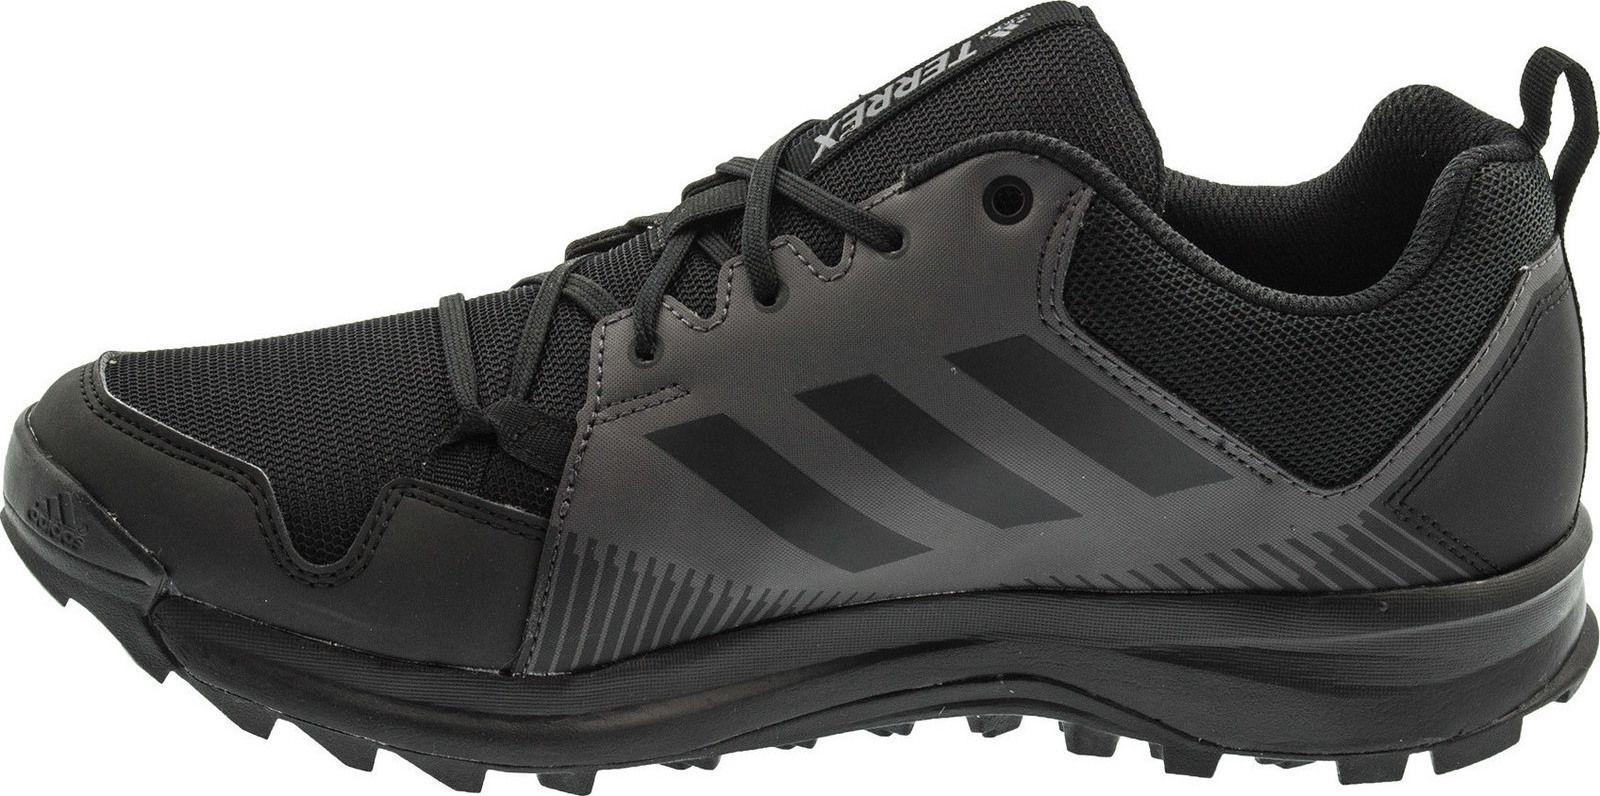 Tenis Adidas Terrex TraceRocker  - Dozze Shoes